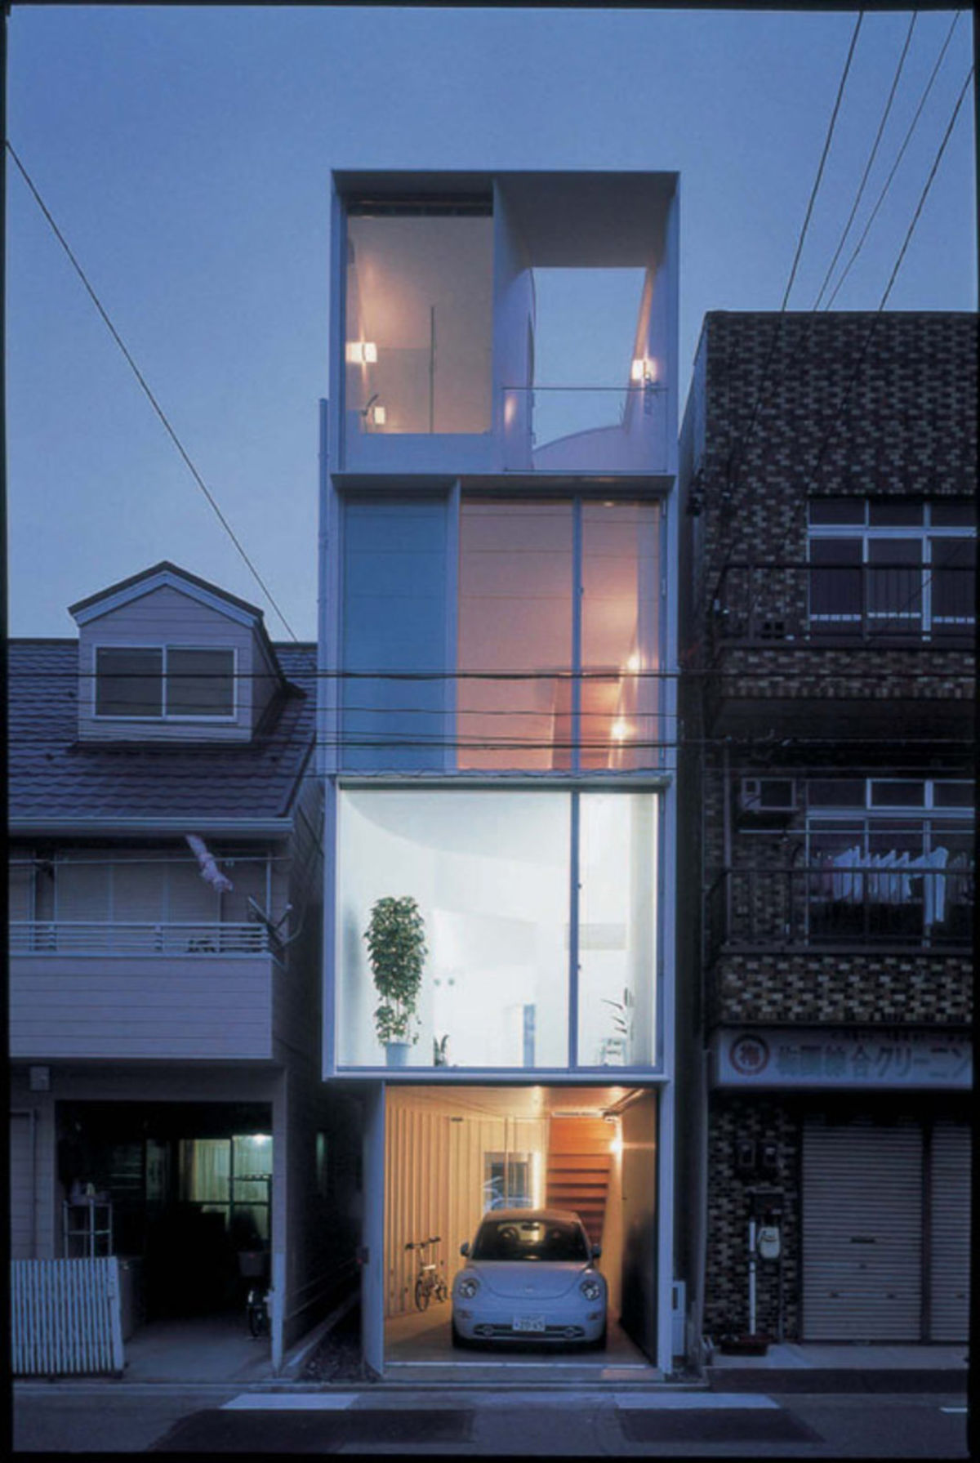 los angeles sofas double size sofa bed dimensions aat + makoto yokomizo architects · nyh divisare